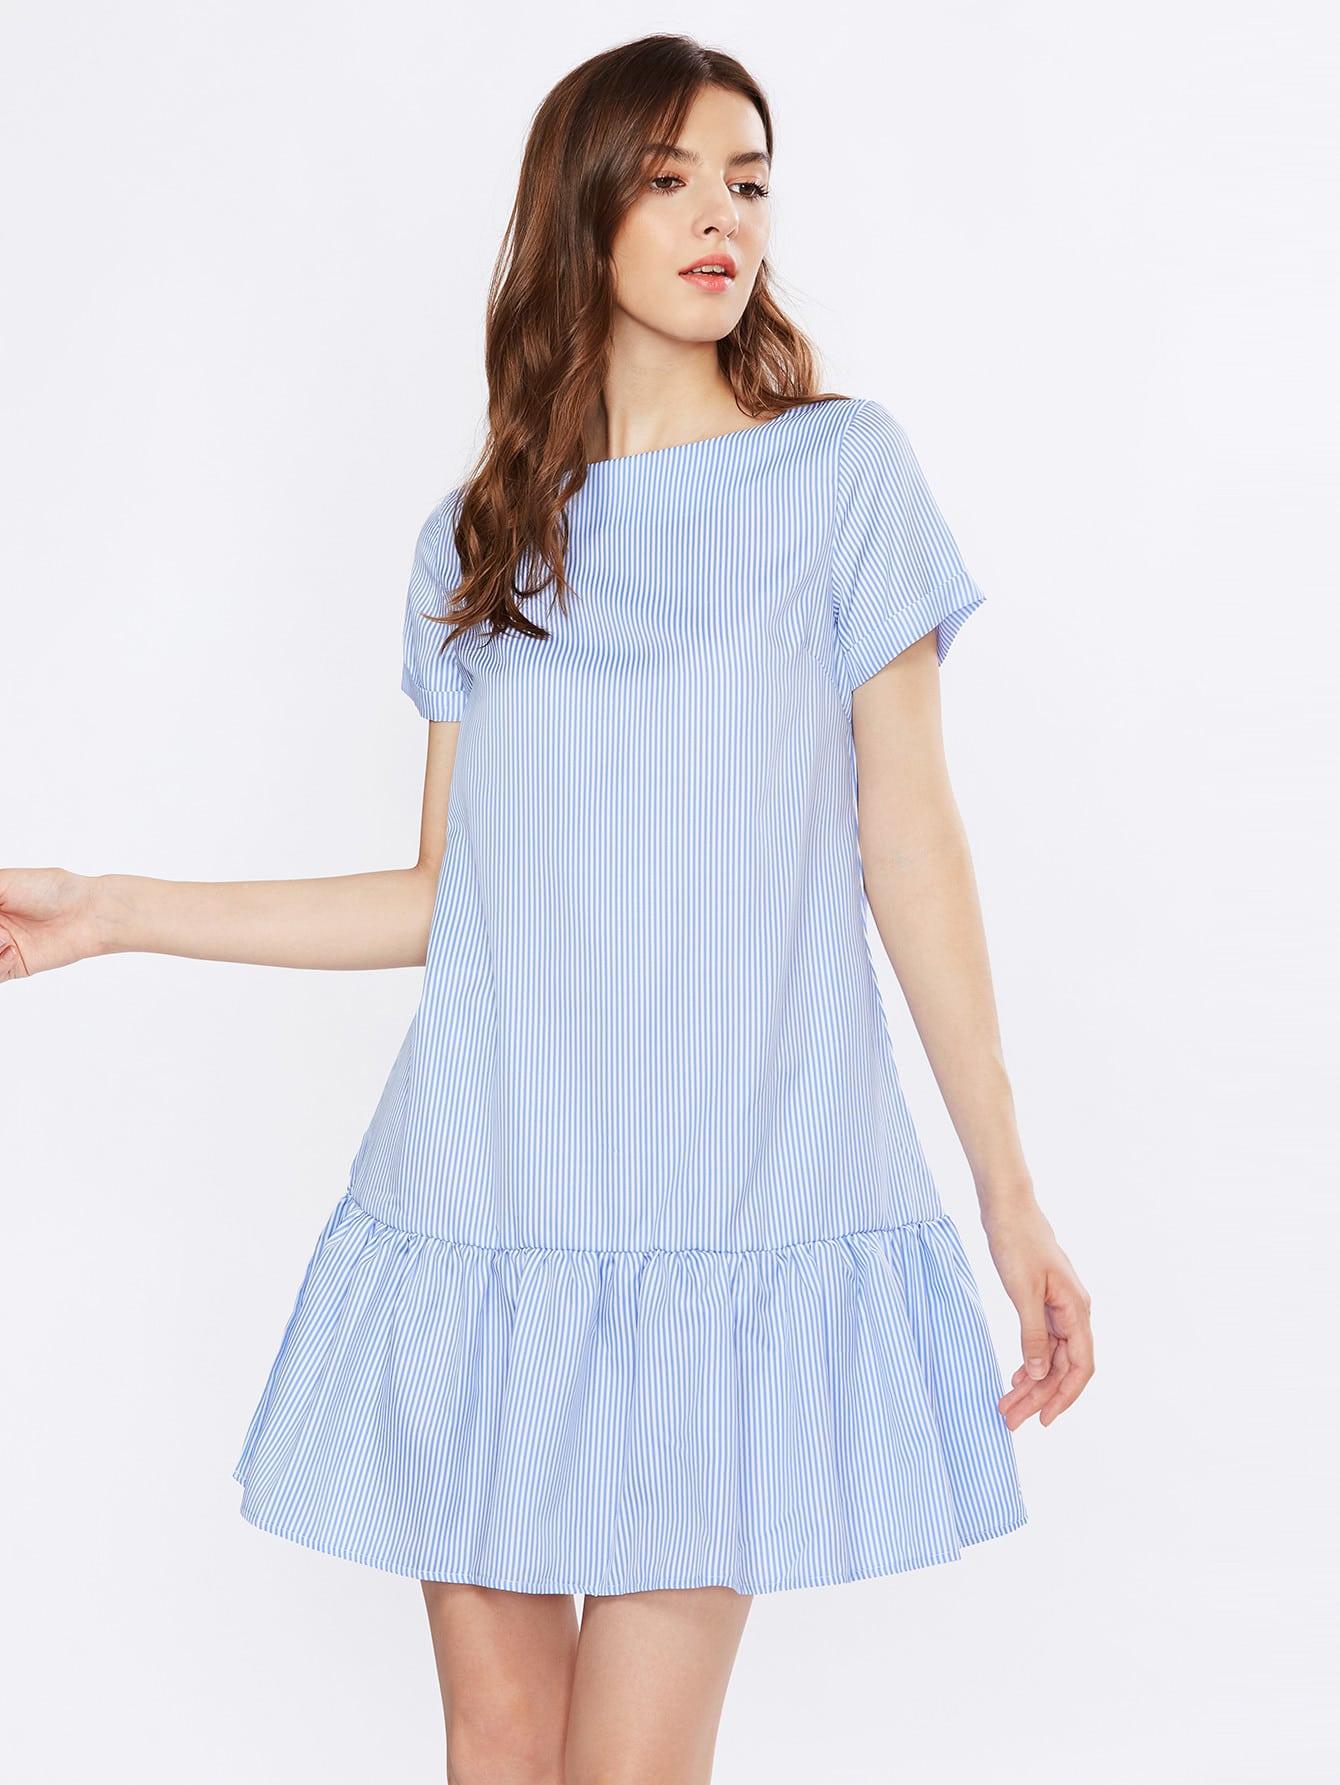 Tiered Hem Pinstripe Dress laminat mostflooring 12208